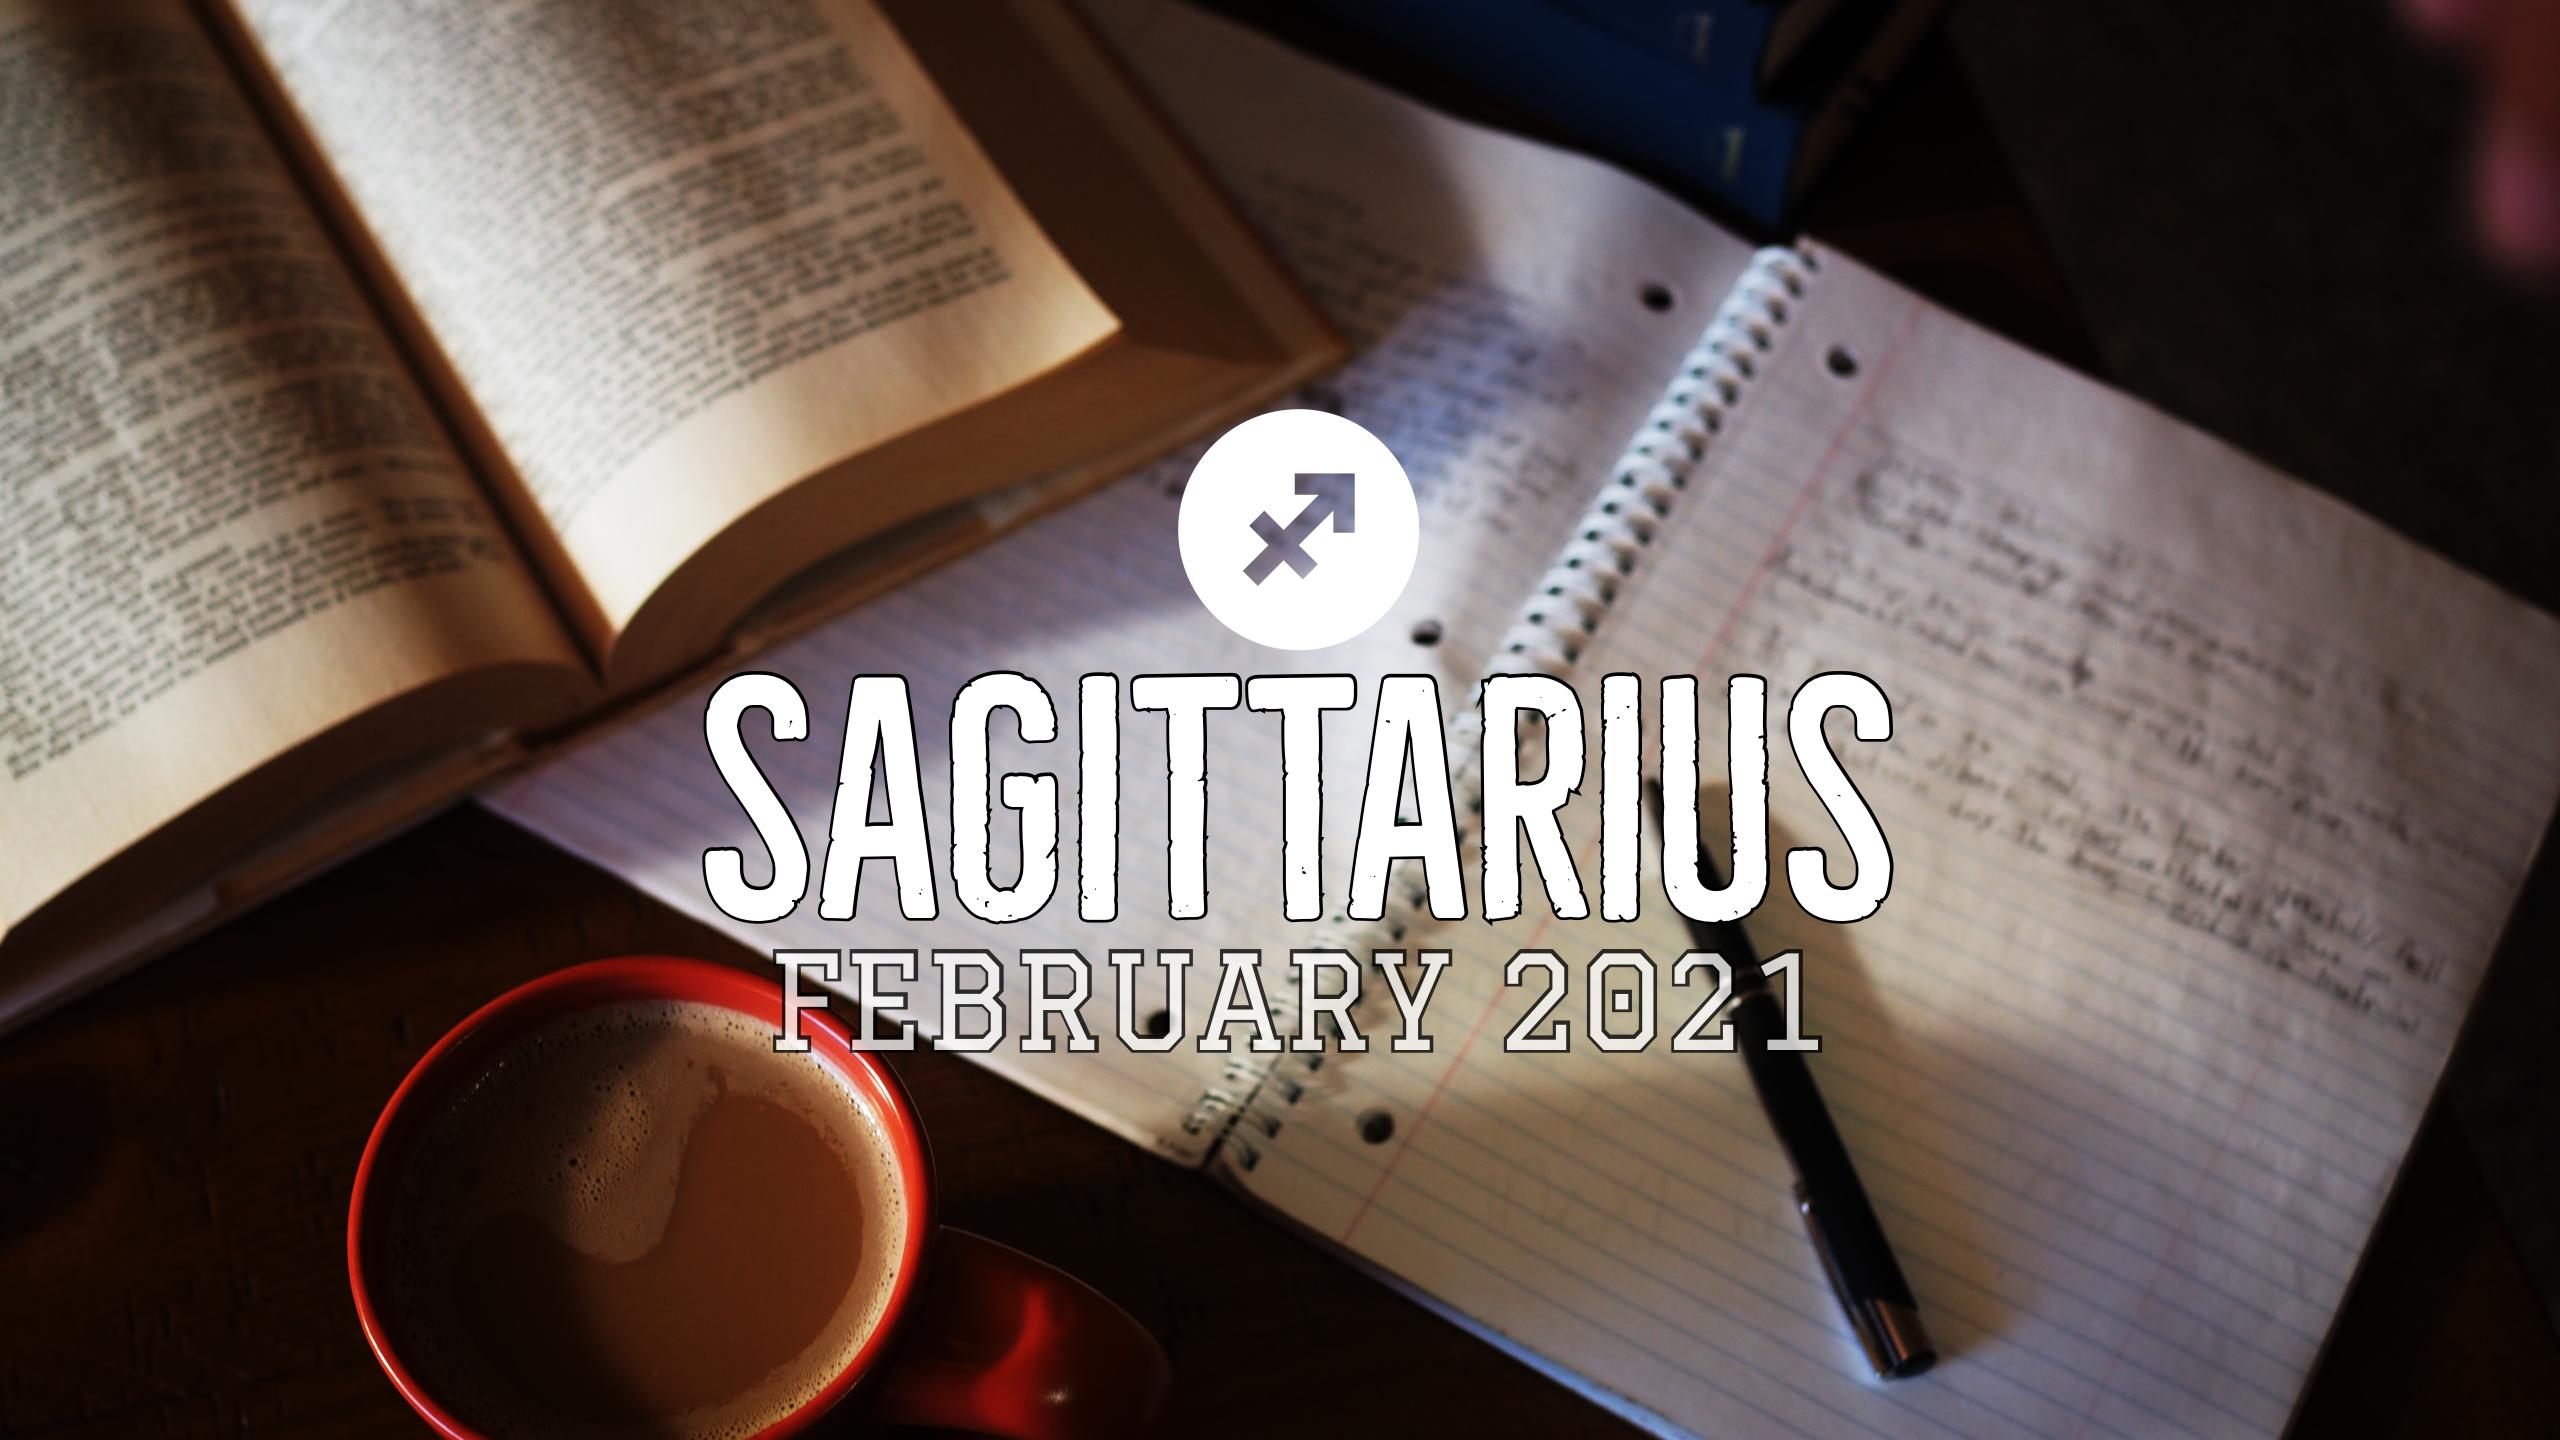 2021 02:Banner:09 Sagittarius